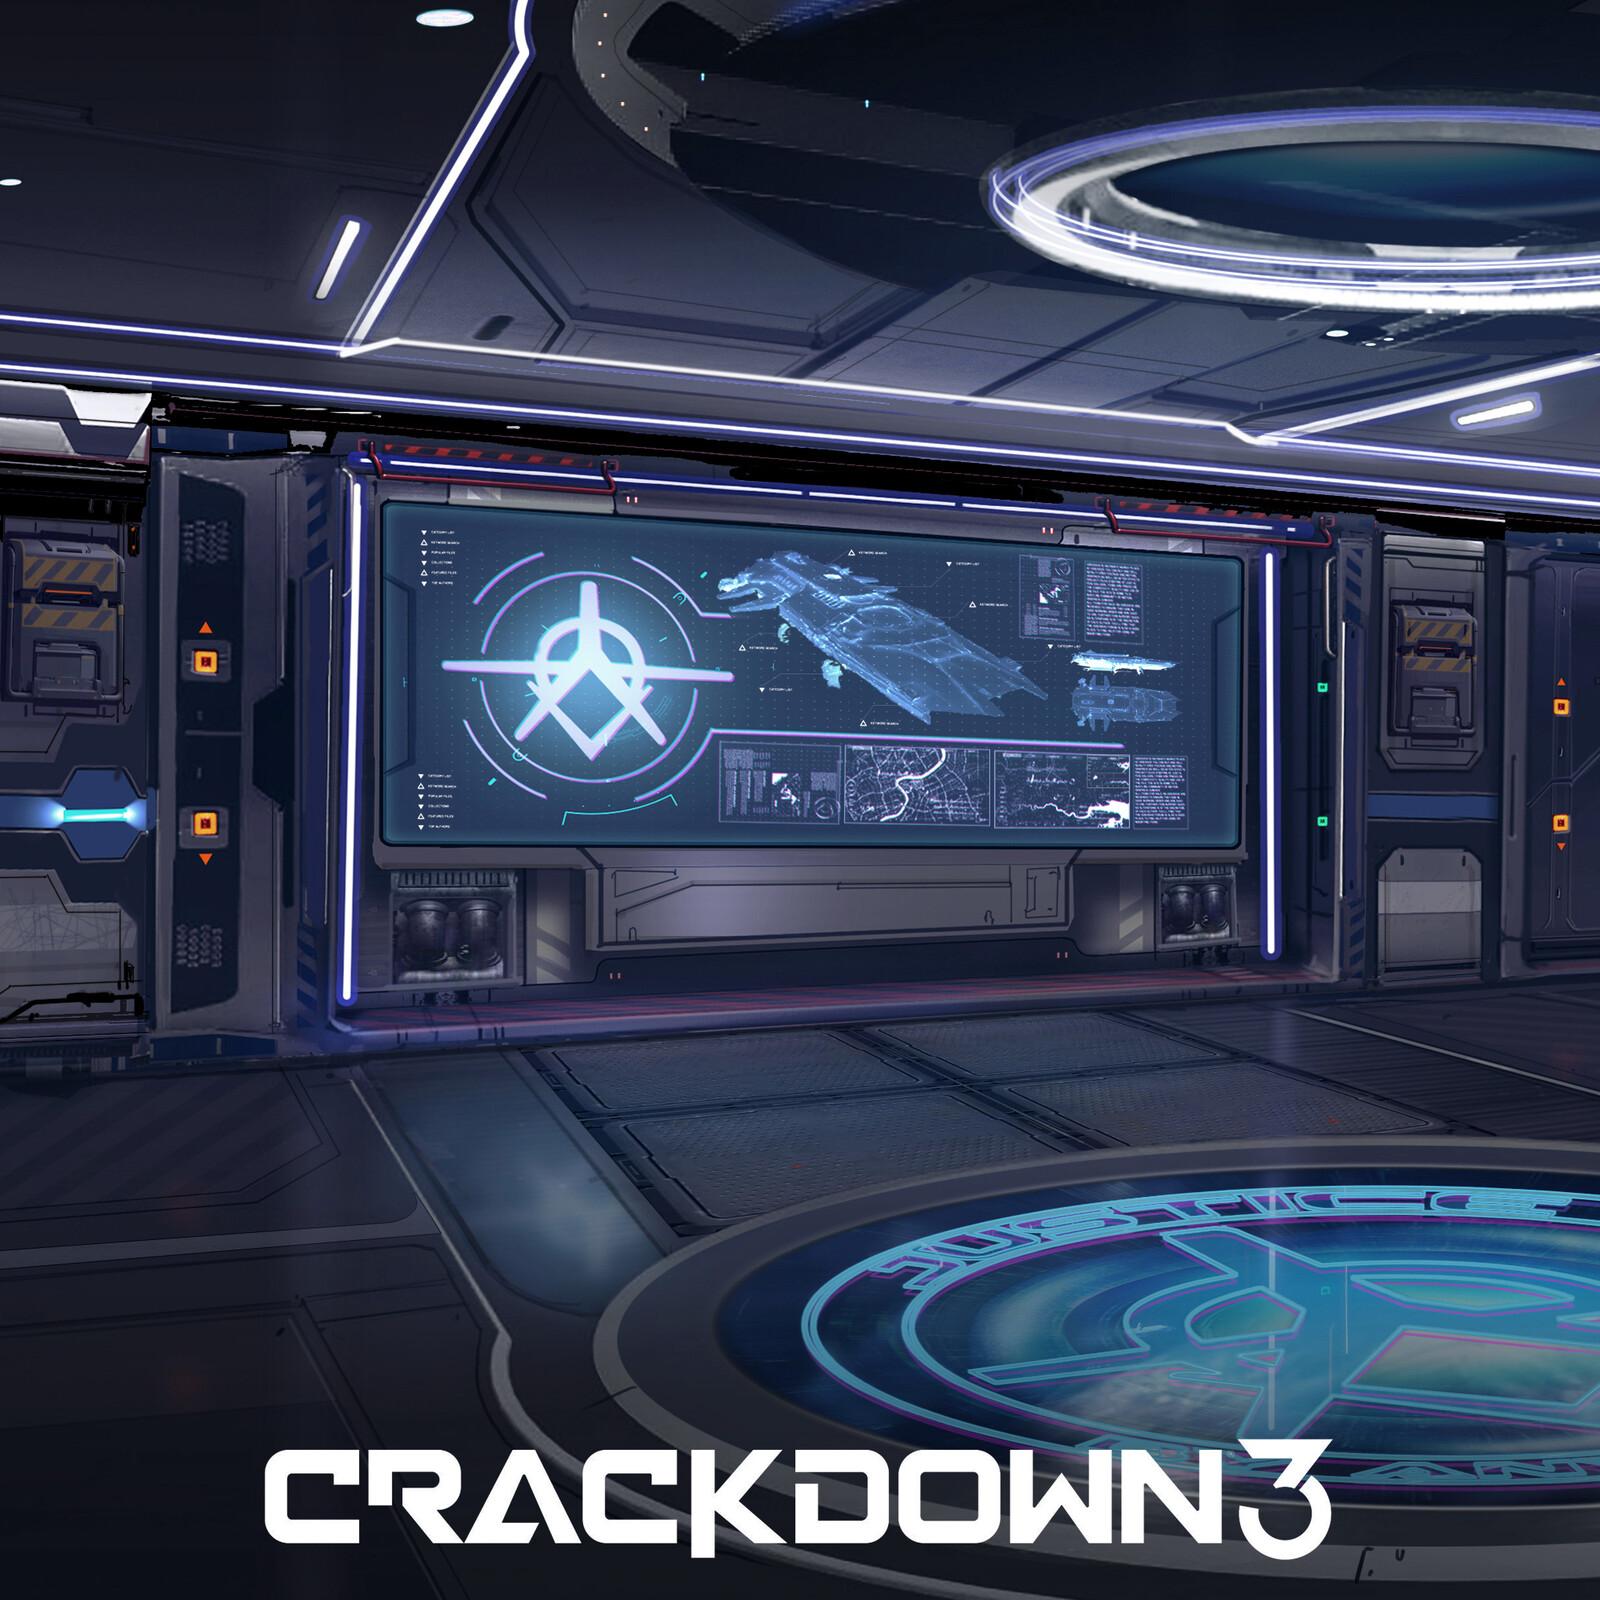 Crackdown 3 - Briefing room